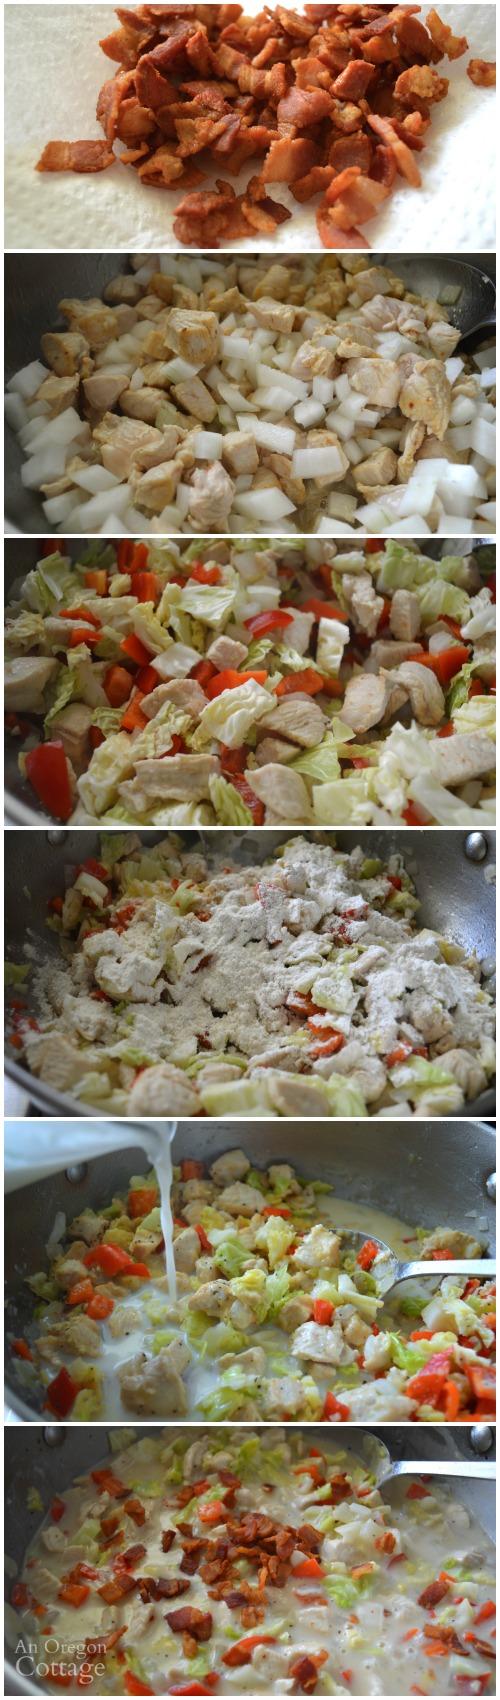 Making chicken pot pie filling from scratch